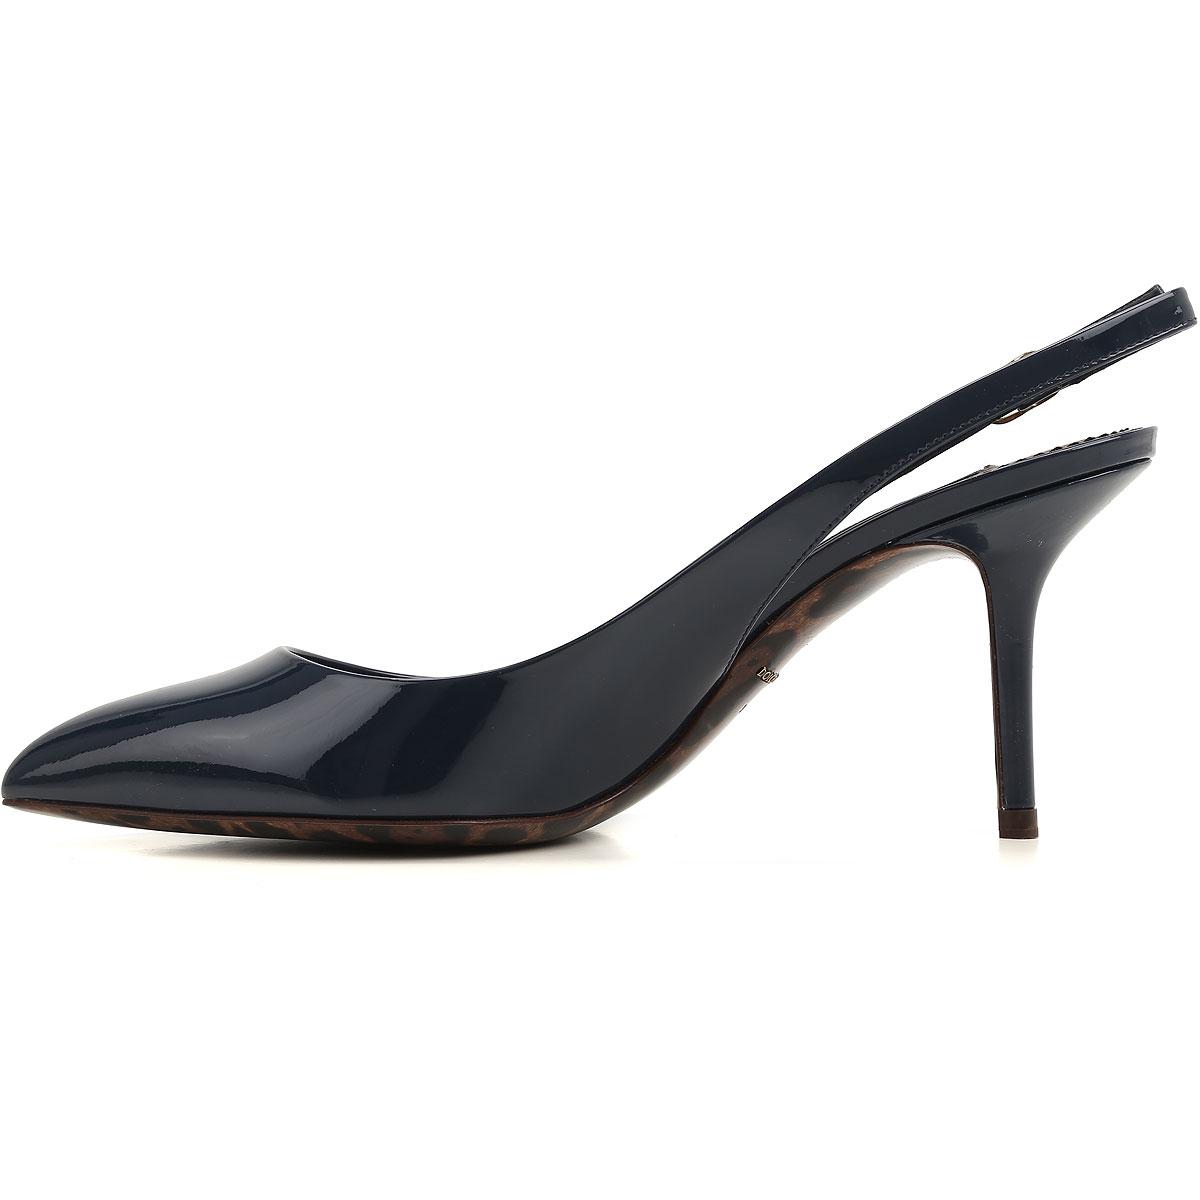 Marina Mujer Dolce Gabbana Para 2018 amp; 19 nbsp; Otoño Zapatos invierno wUFUIzxPq